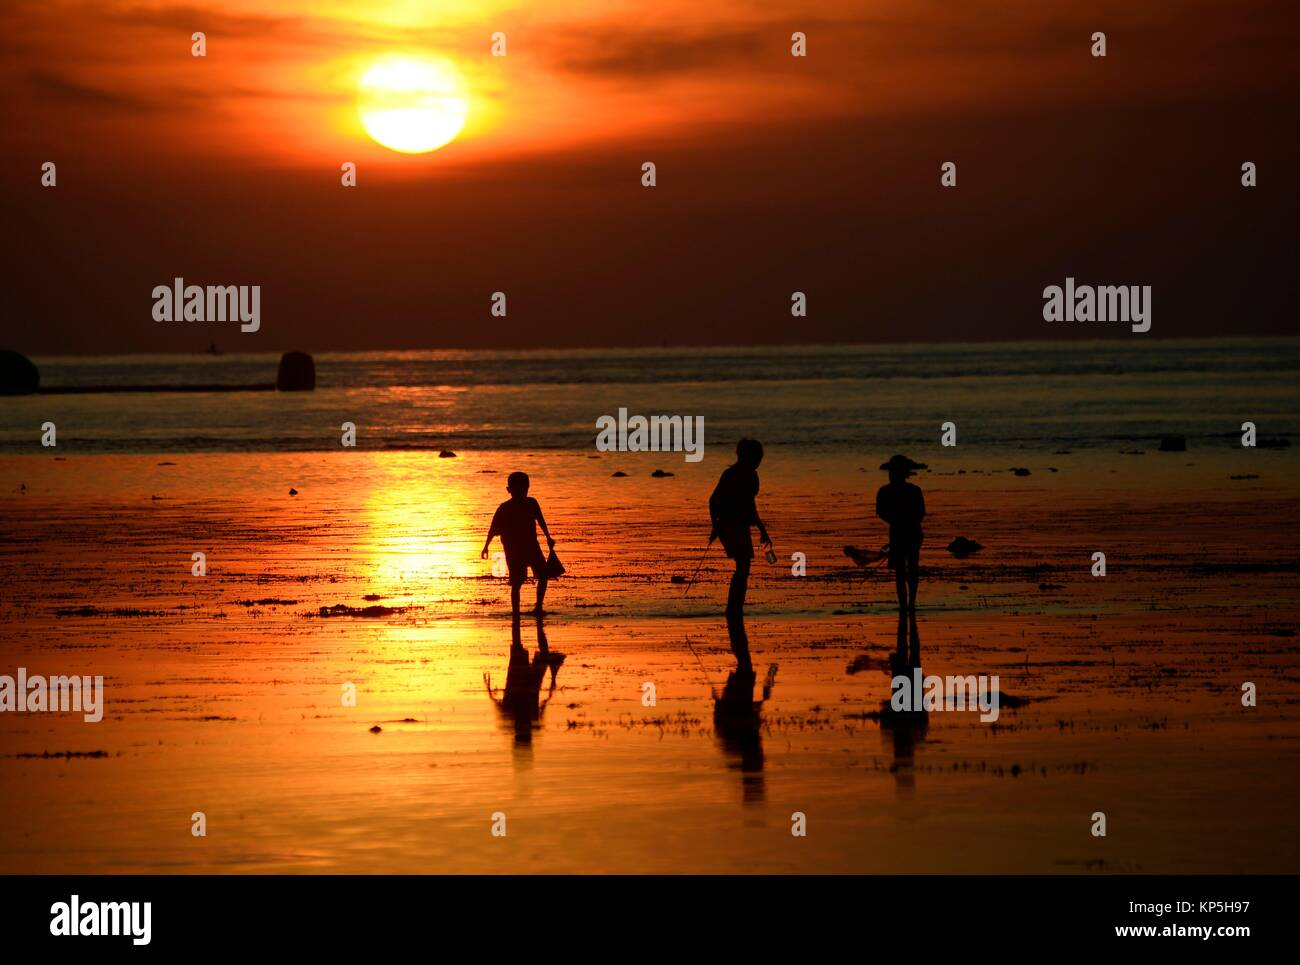 Lovina Stock Photos & Lovina Stock Images - Alamy